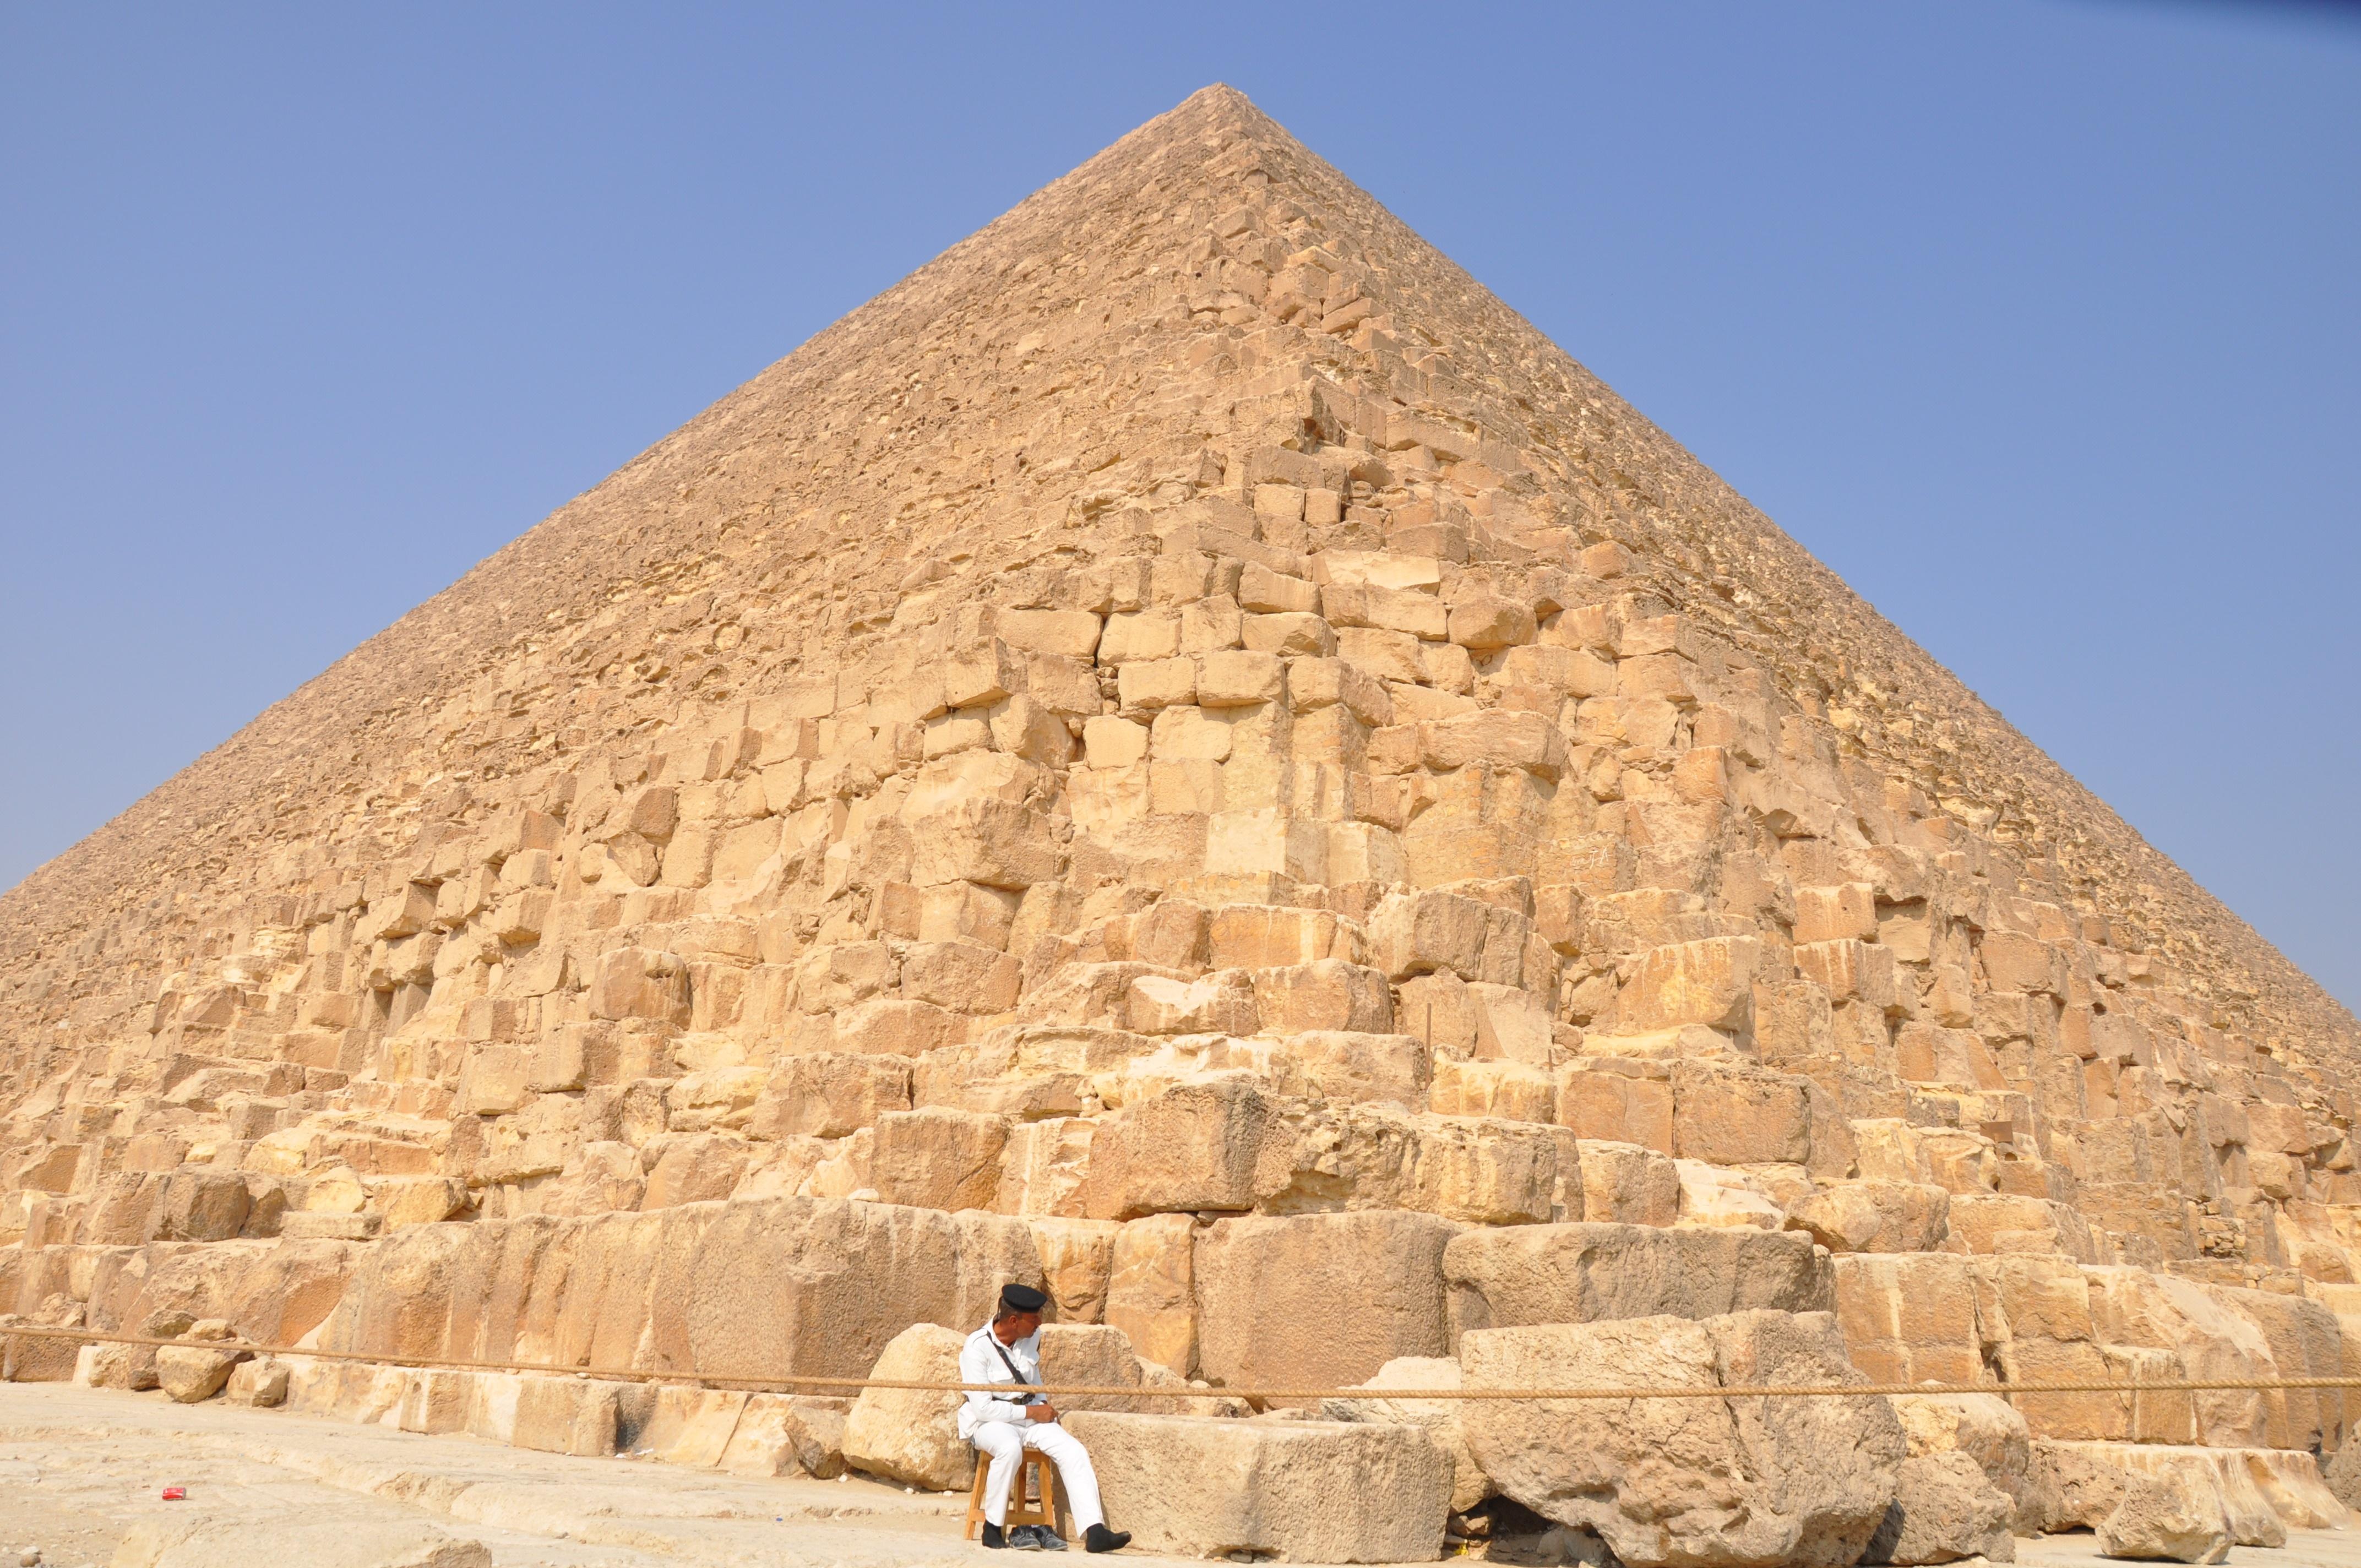 Gambar Monumen Perjalanan Piramida Tengara Mesir Candi Tanah